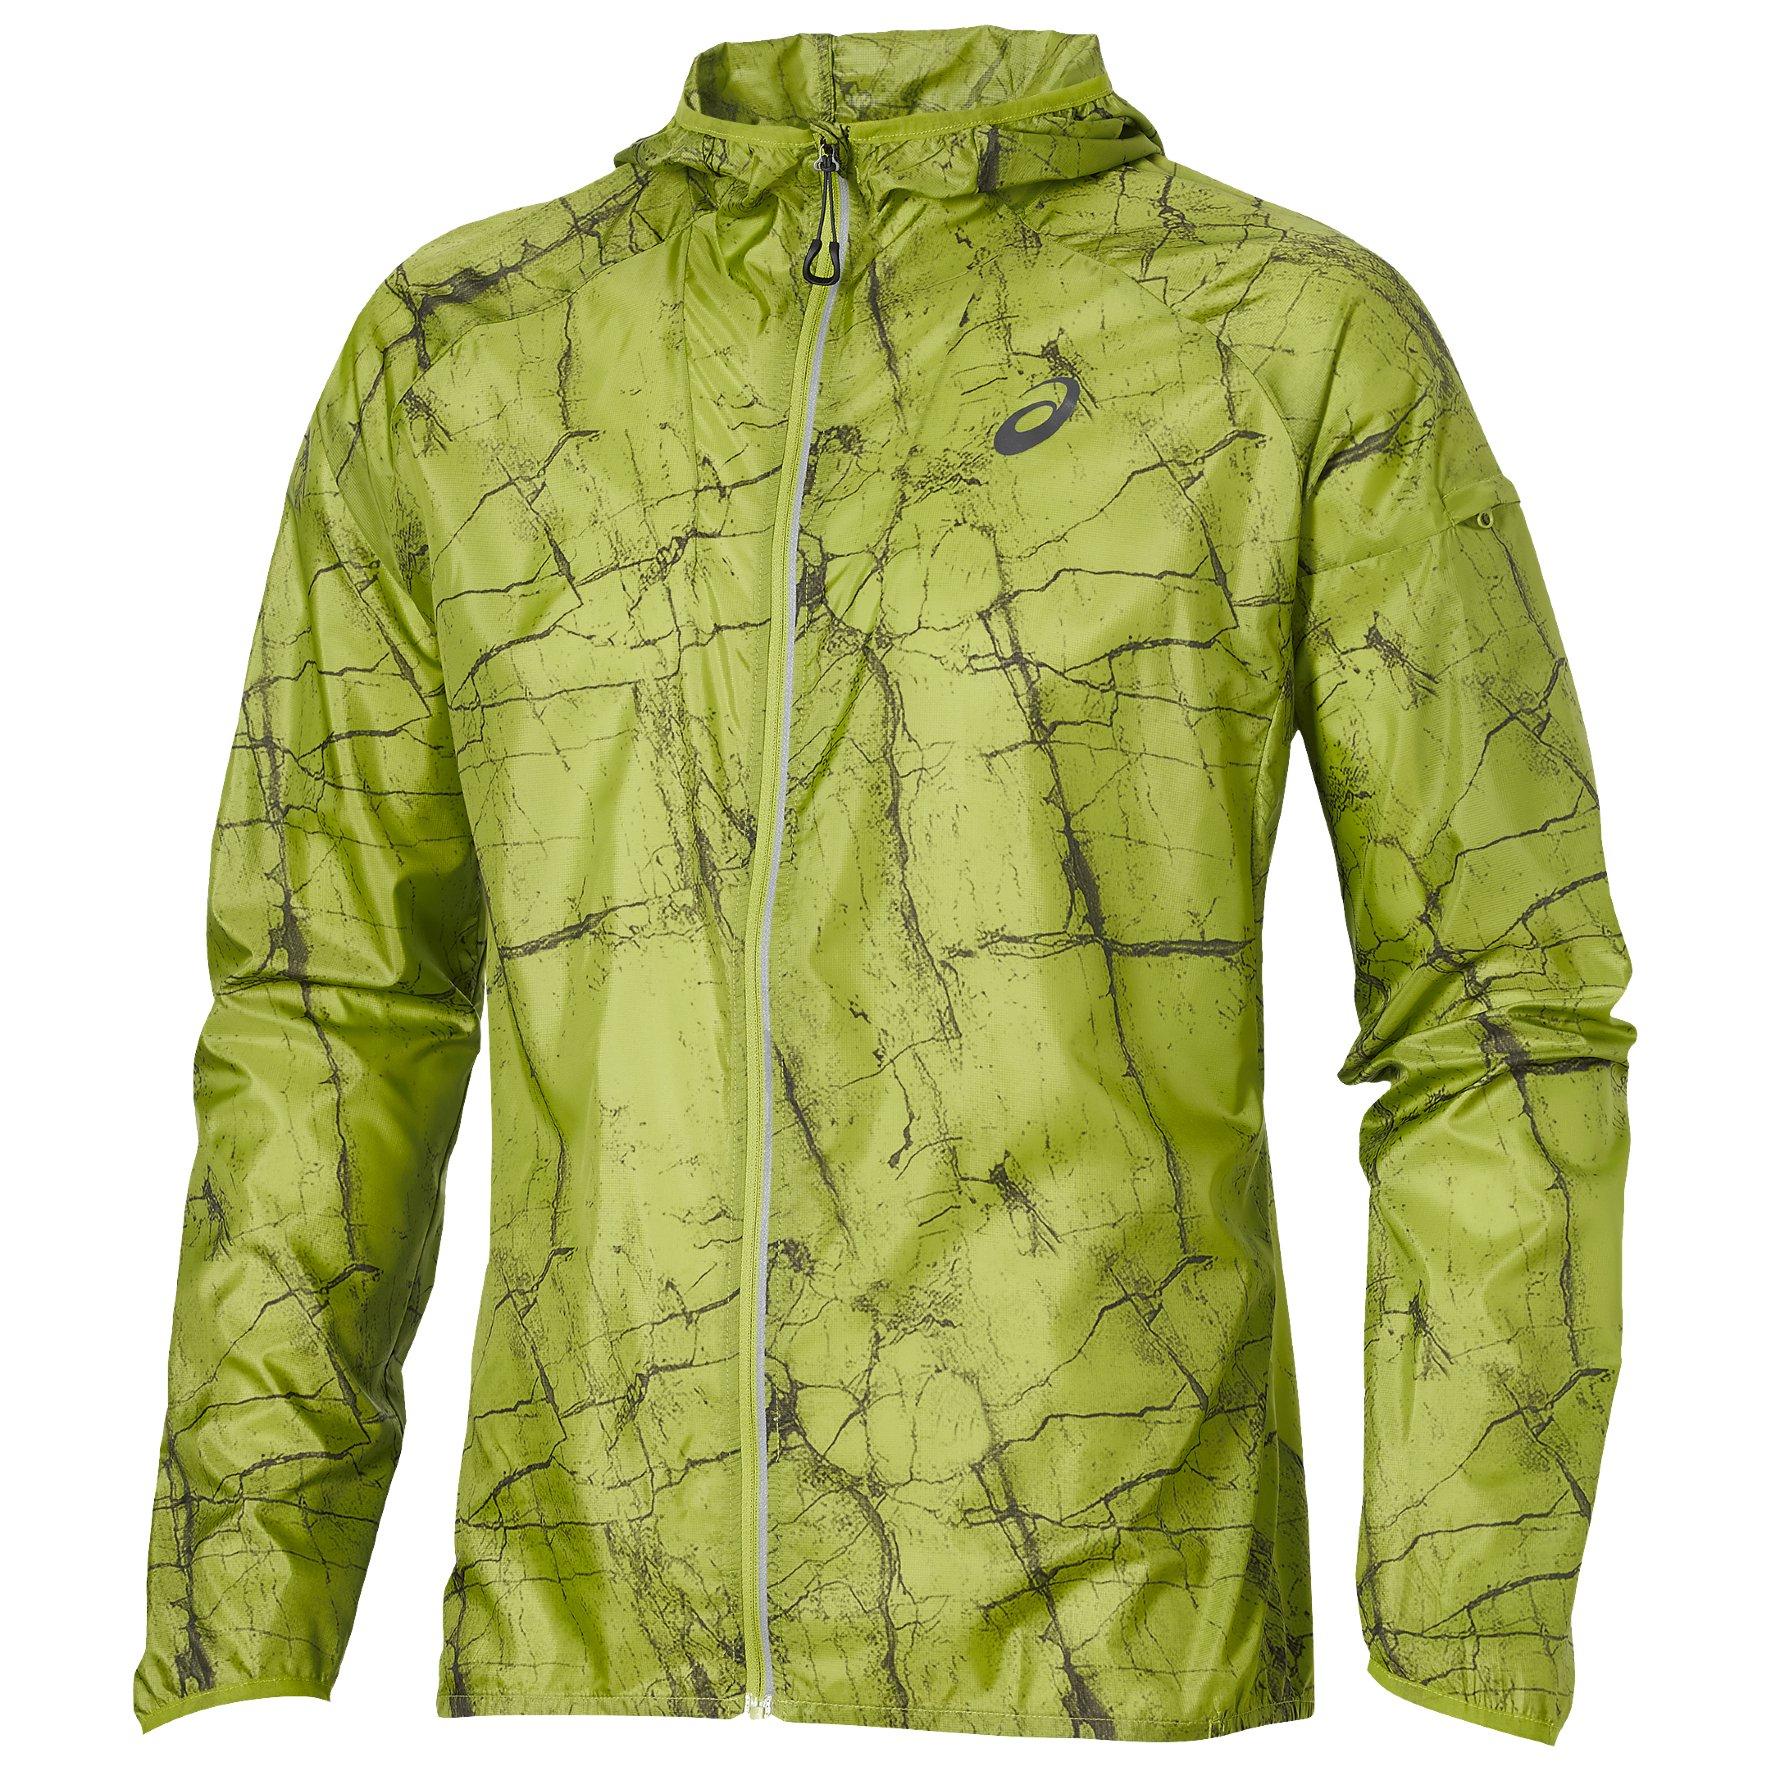 fdeef16986f8 Купить куртку Asics FujiTrail Pack Jacket   Интернет-магазин ...